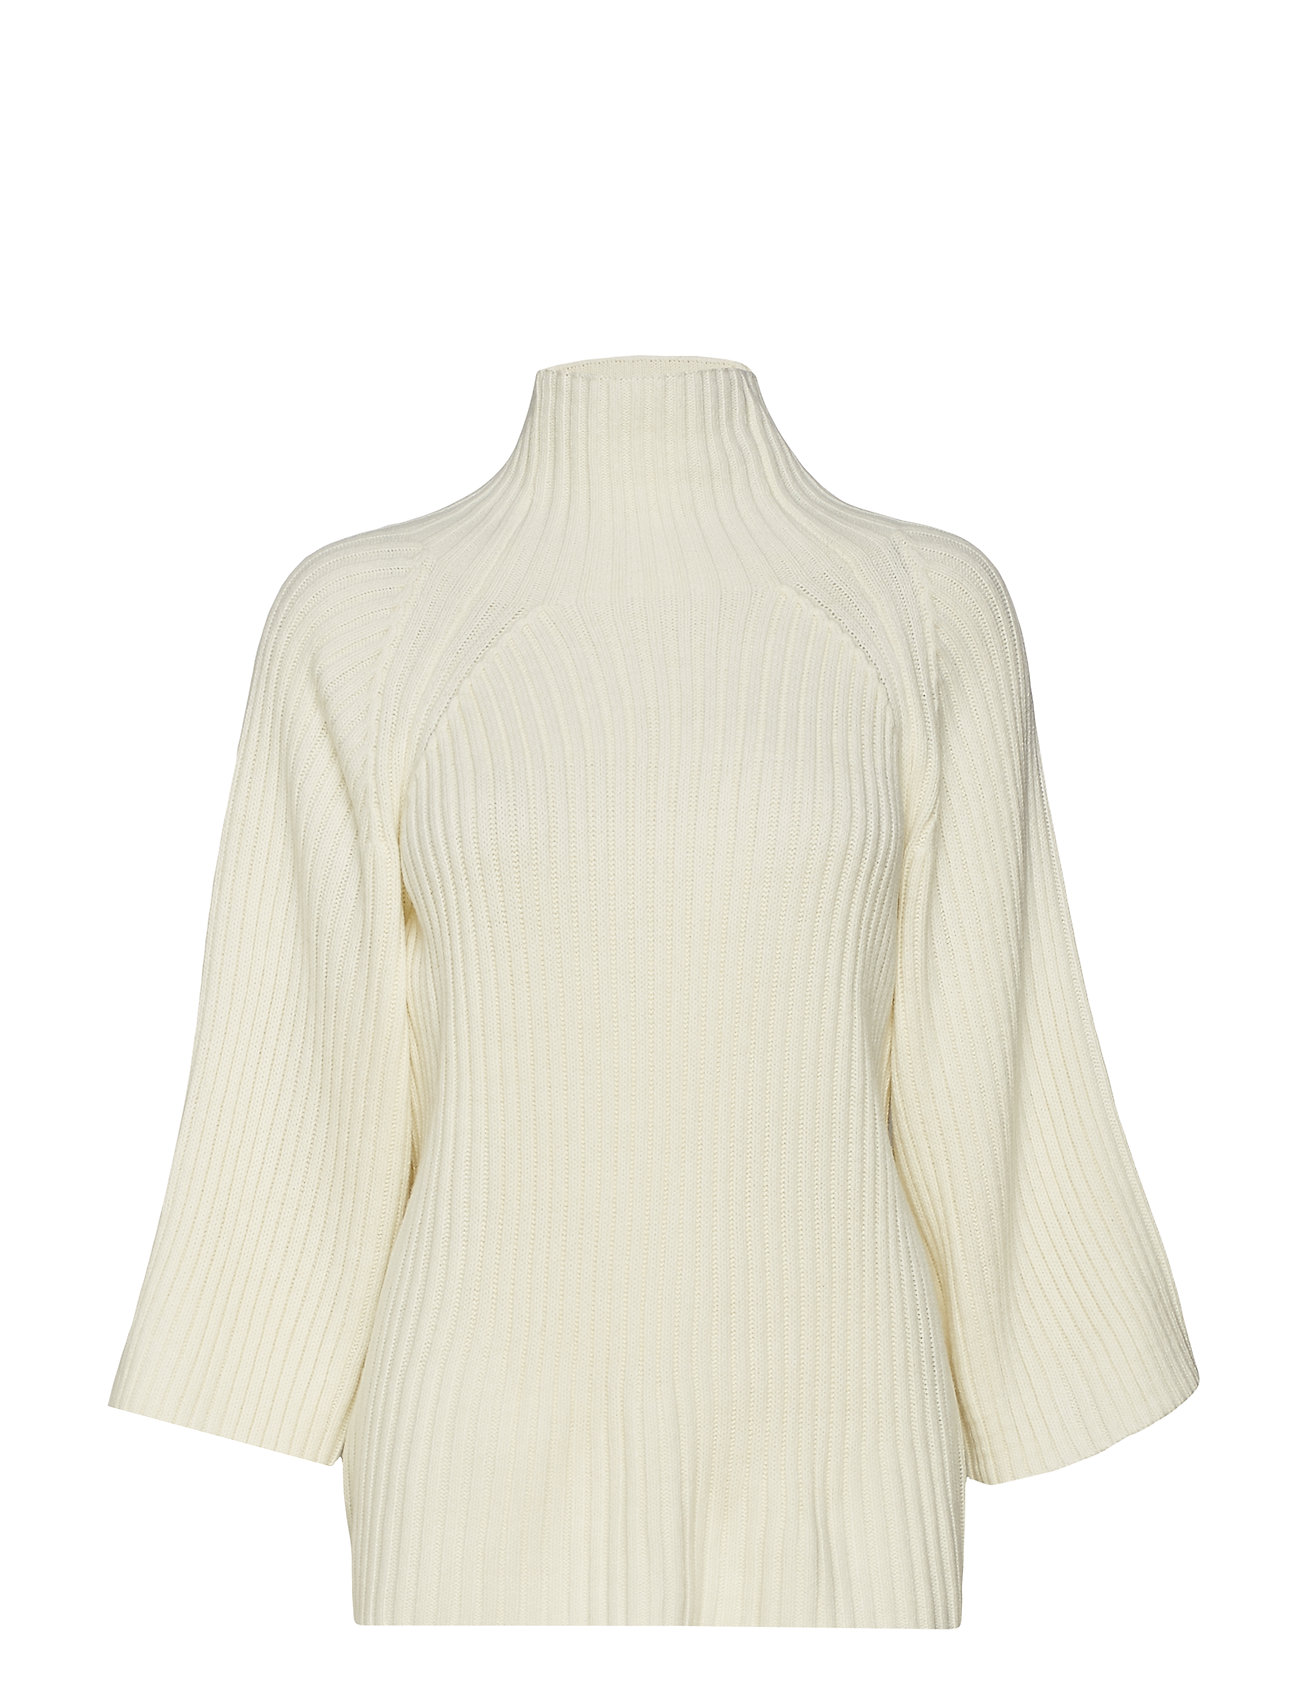 Gestuz Torry pullover YE18